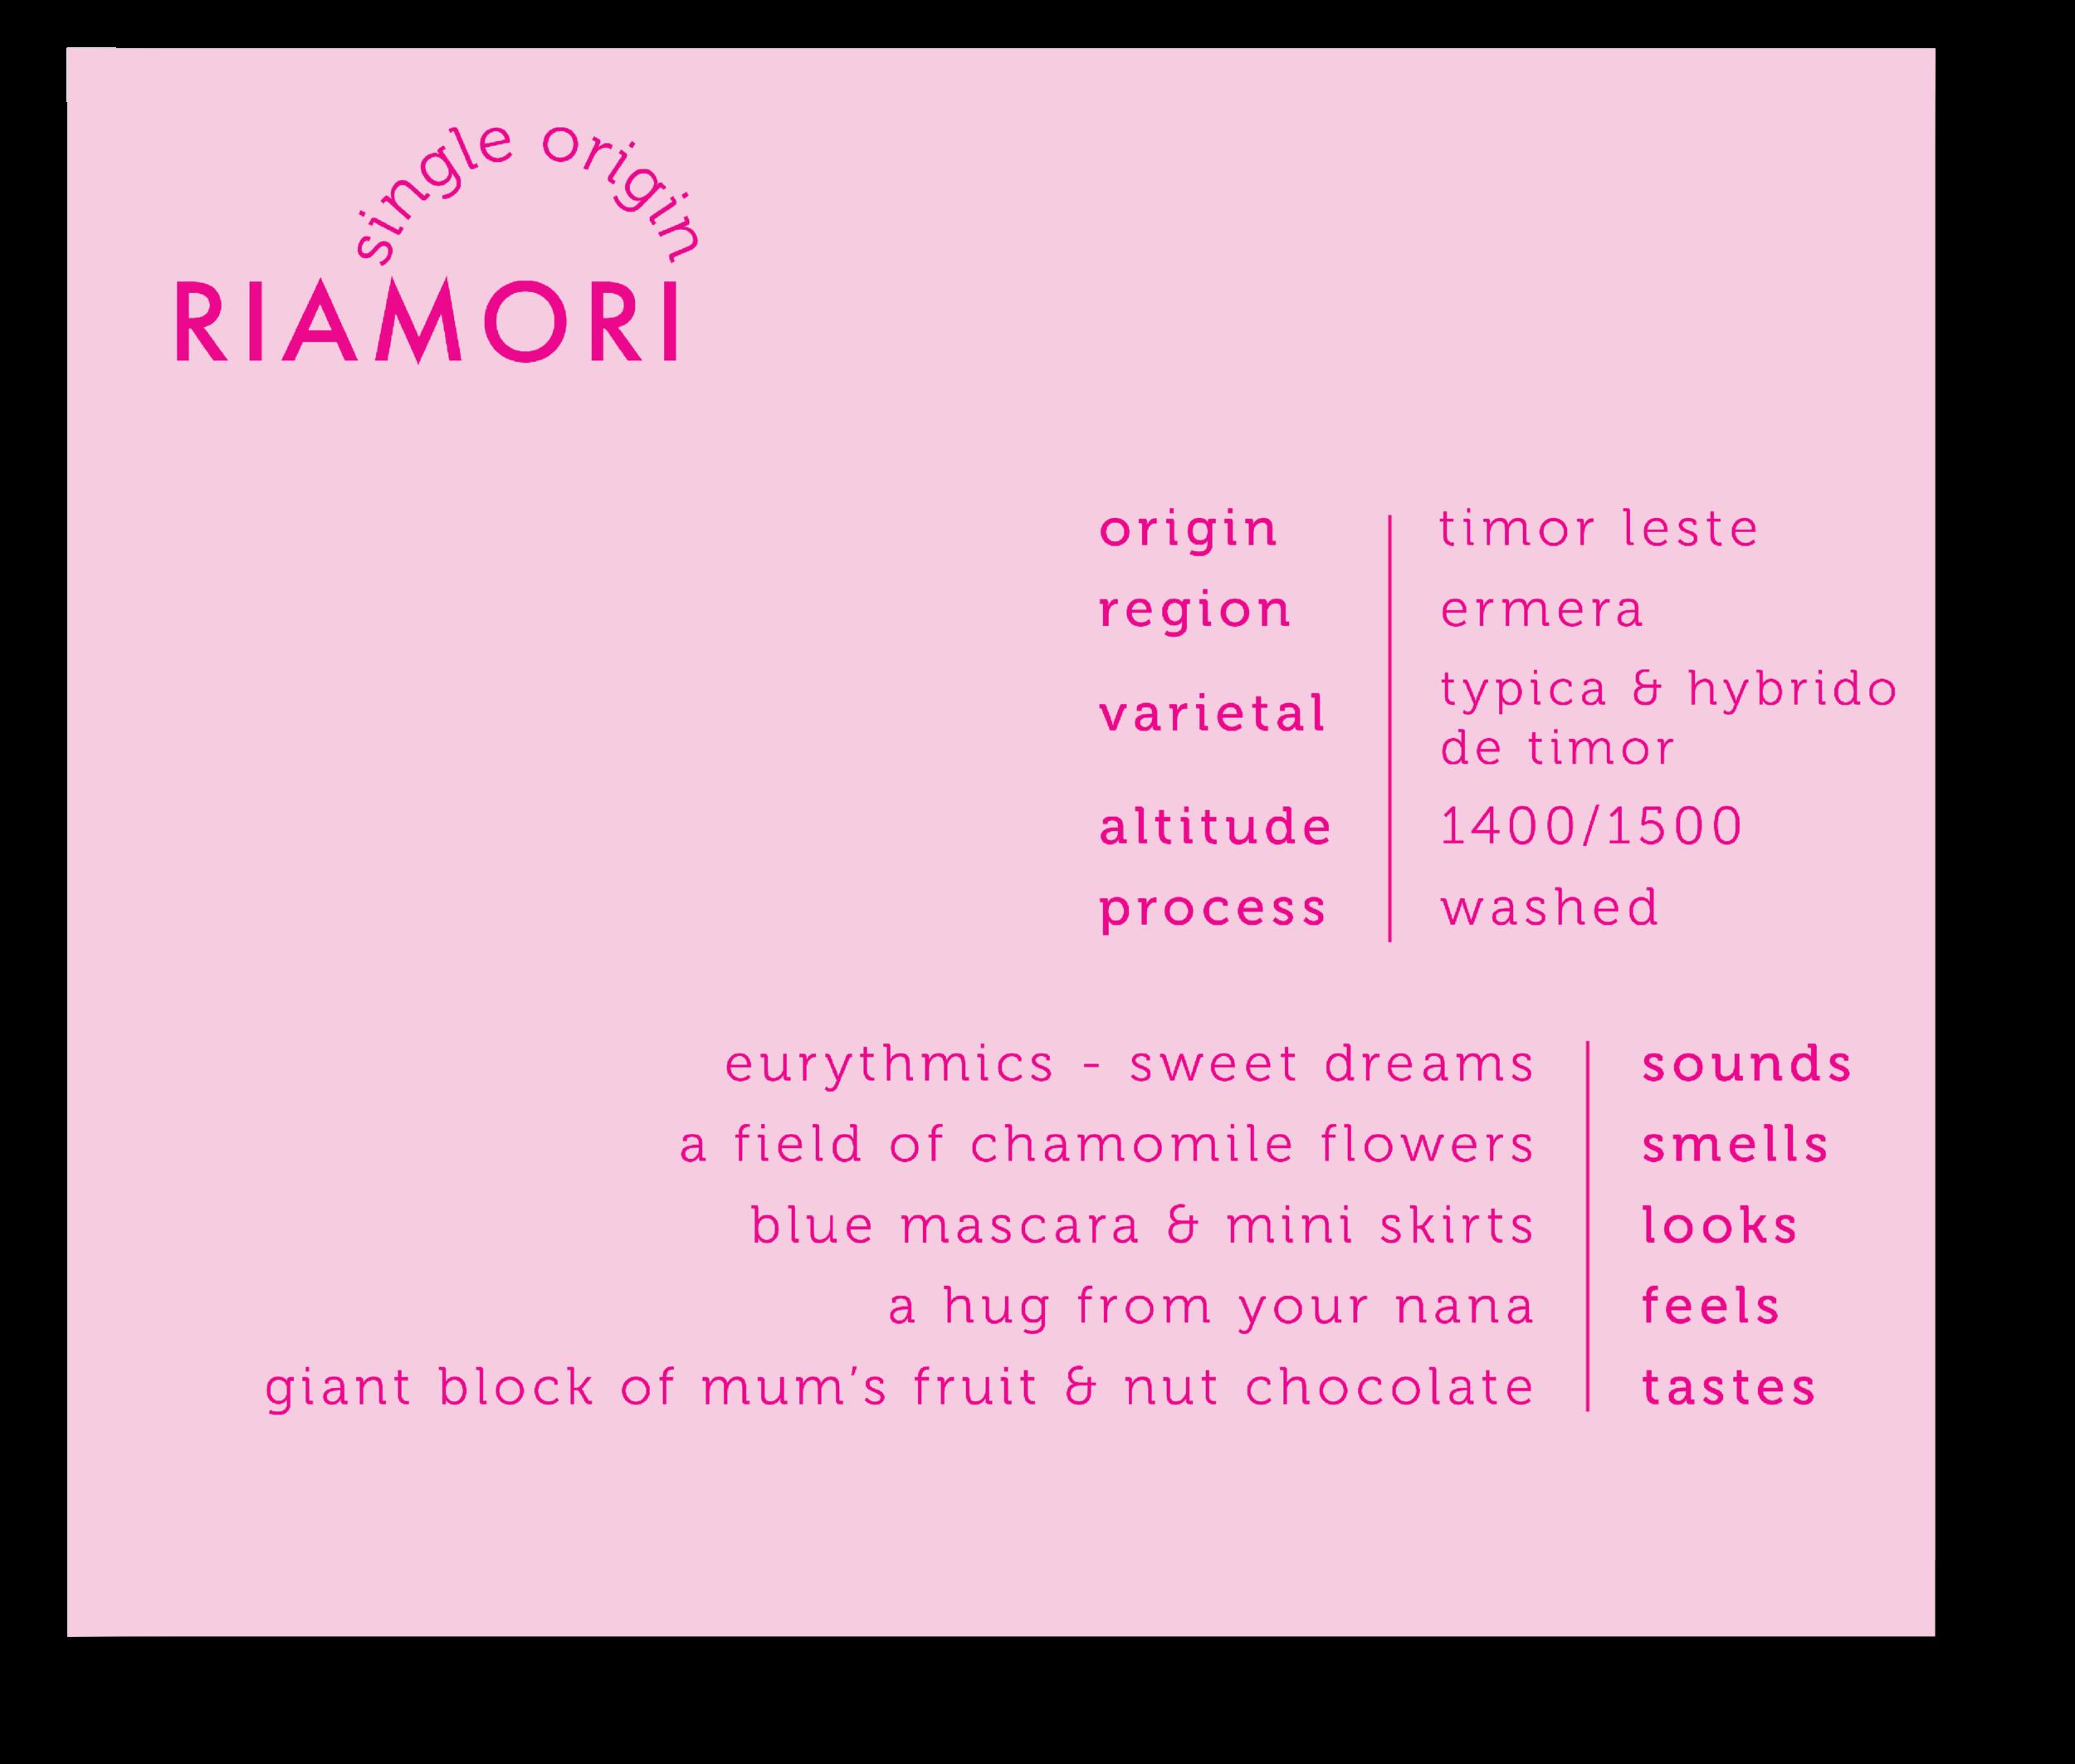 riamori_drop shadow.png